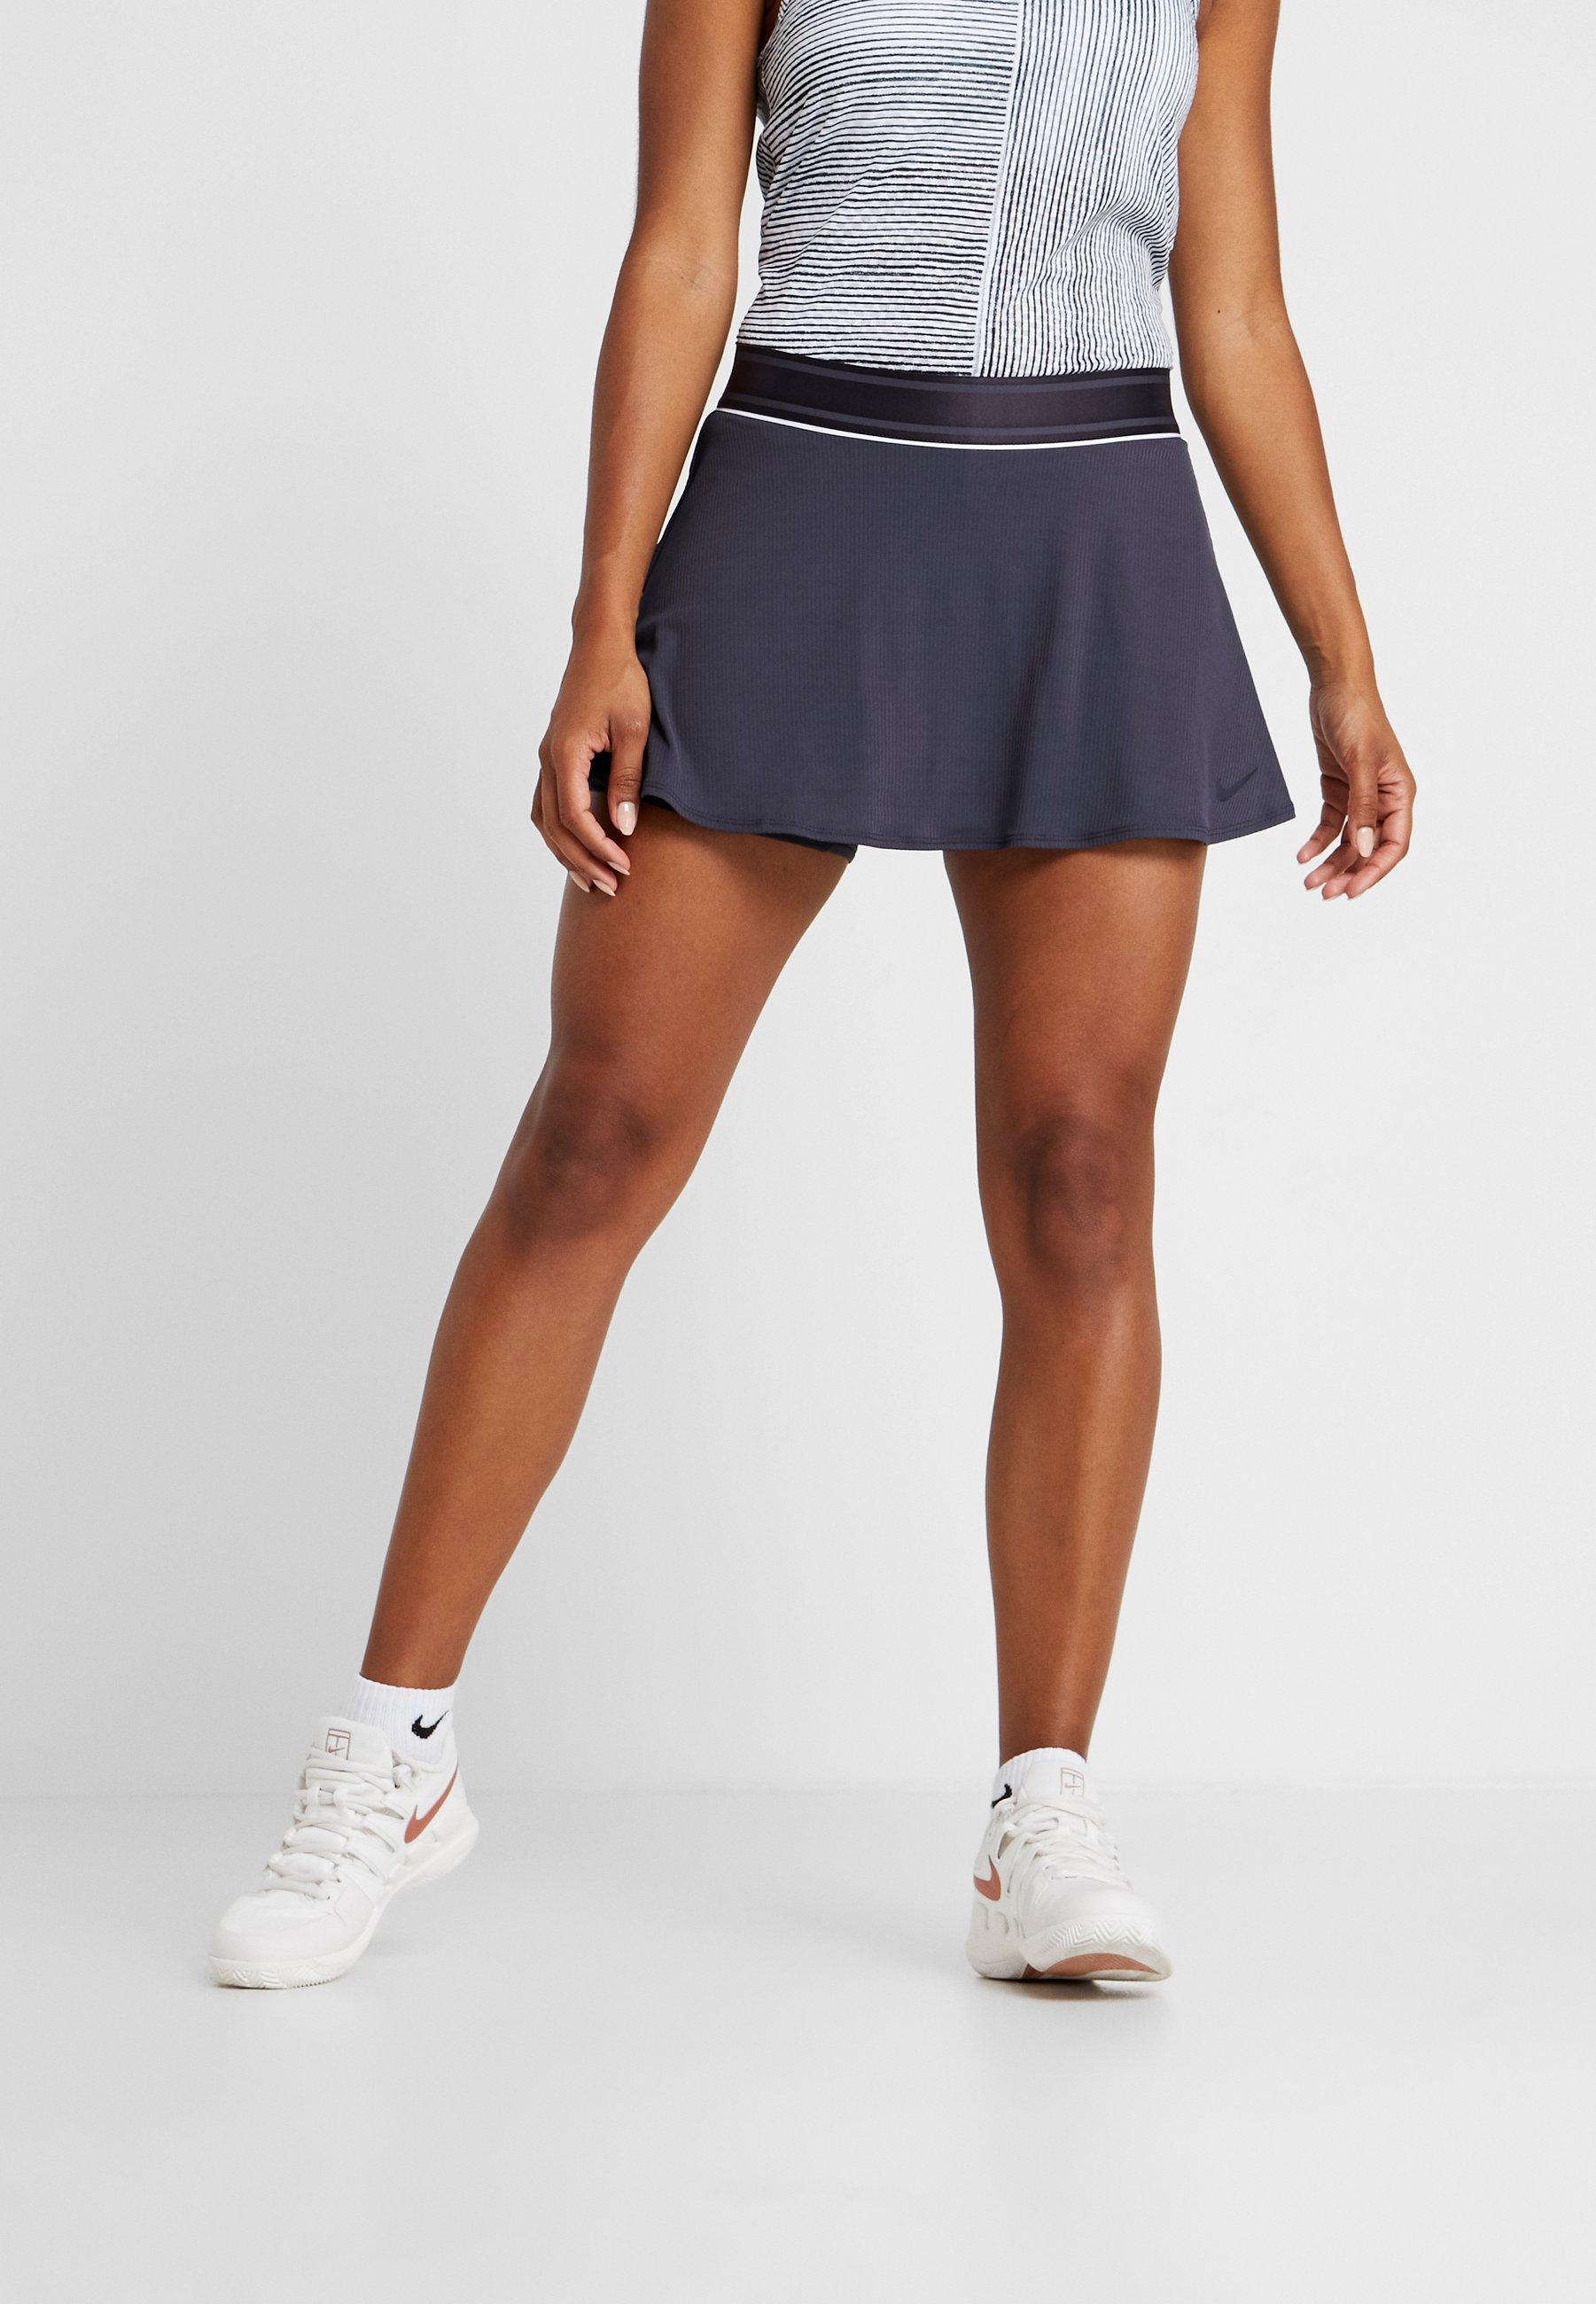 Nike Dry Iron white Performance SkirtJupe Grid De Sport 2IH9WDE